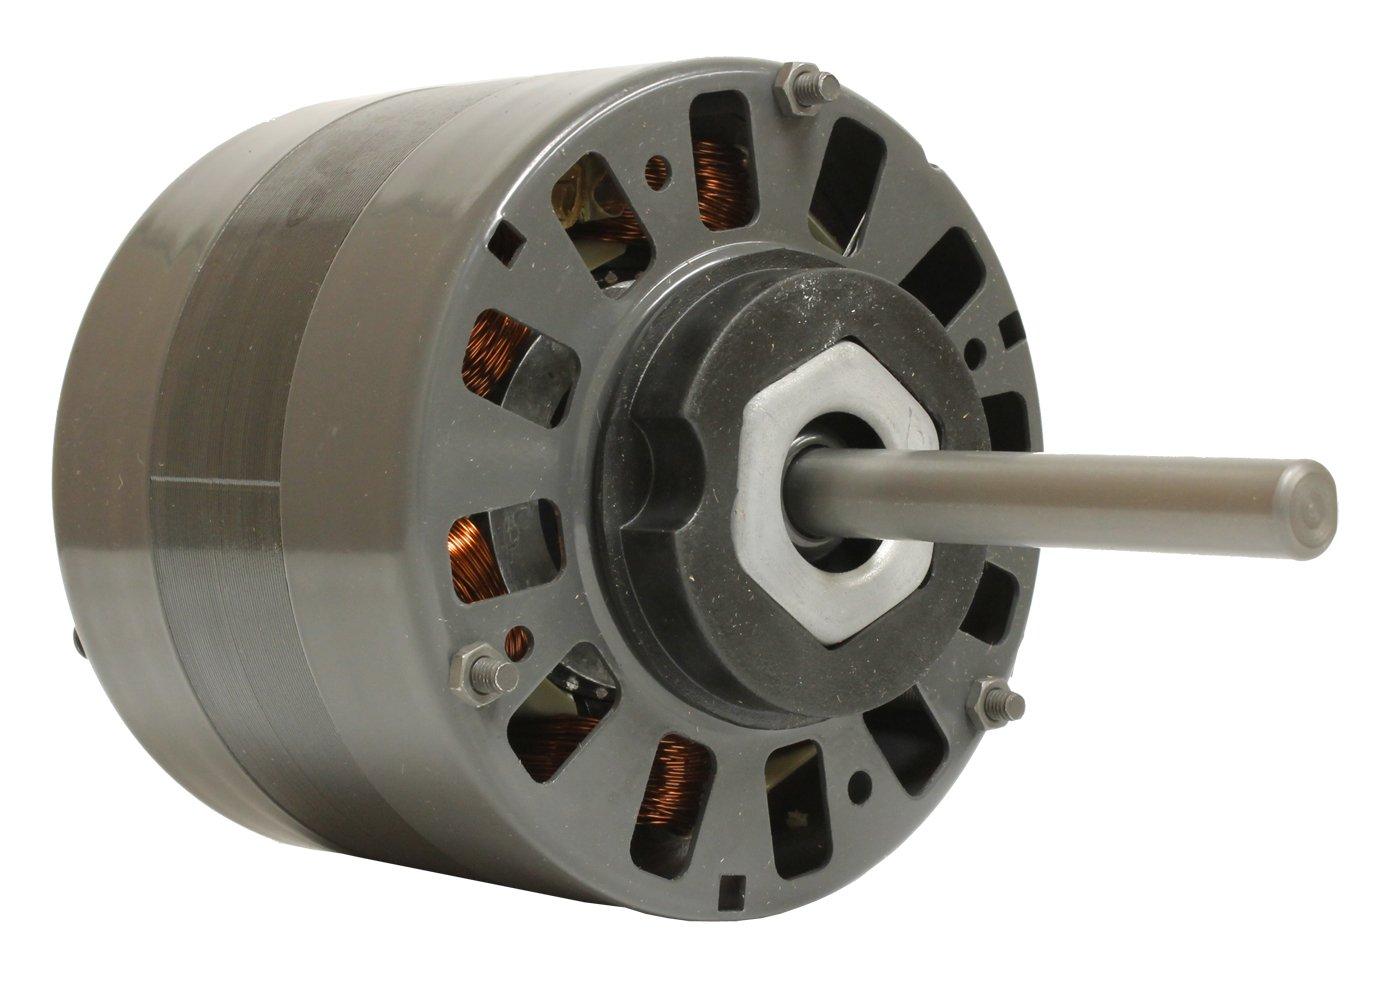 Fasco D656 Blower Motor, 5.0-Inch Frame Diameter, 1/8 HP, 1050 RPM, 230-volt, 2.1-Amp, Sleeve Bearing by Fasco B009JCWBFW